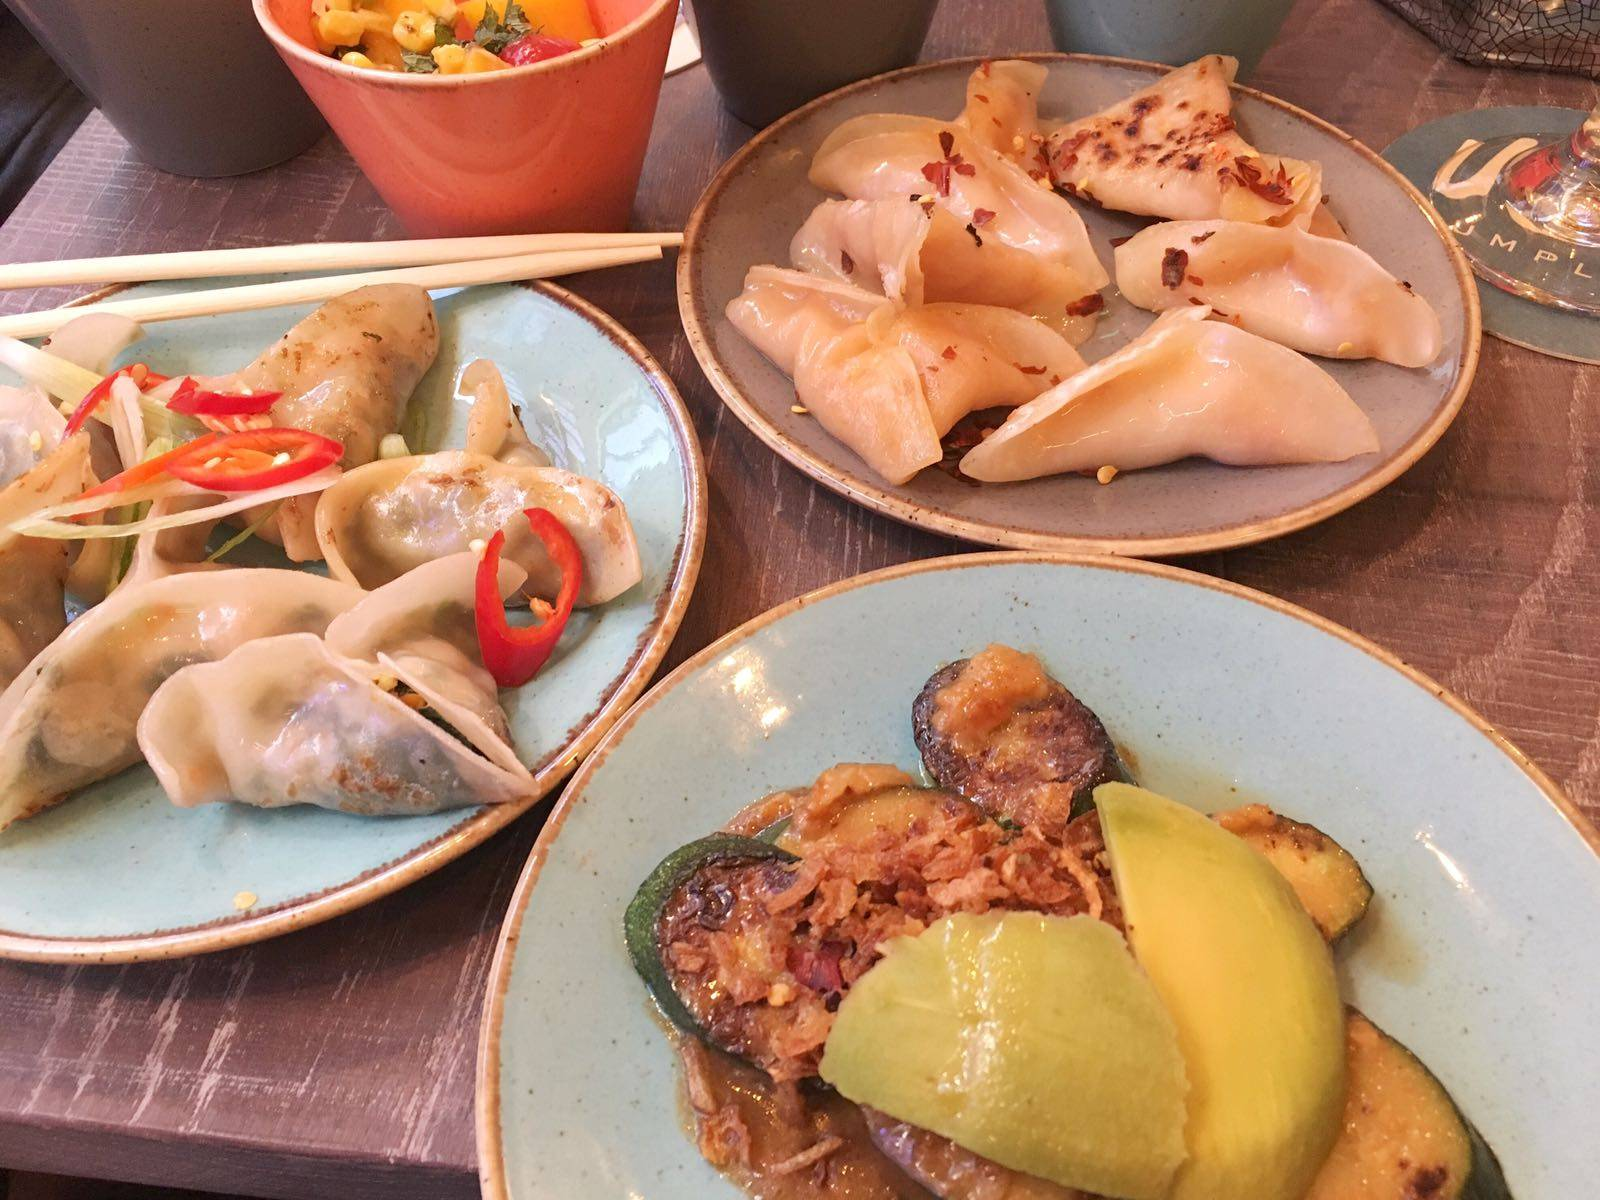 Ugly Dumpling Vegan Carnaby Street London